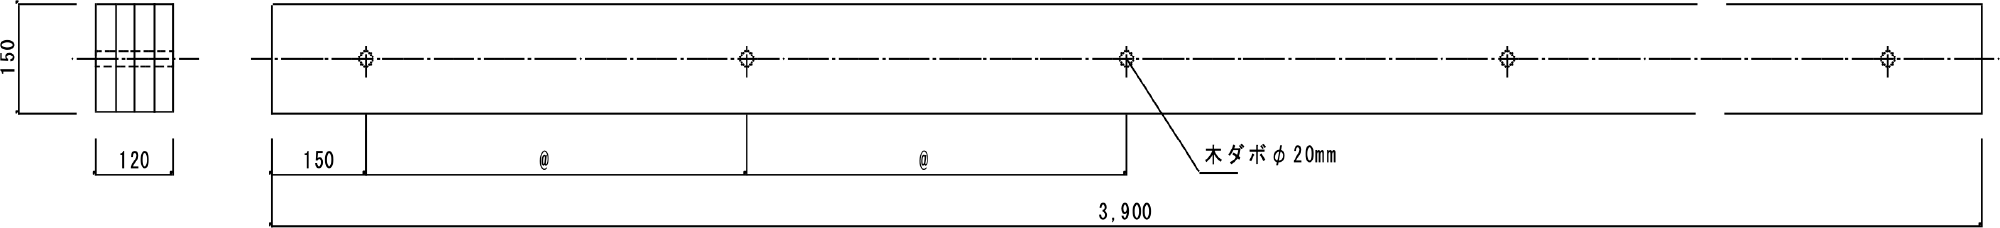 A4~A6試験体姿図